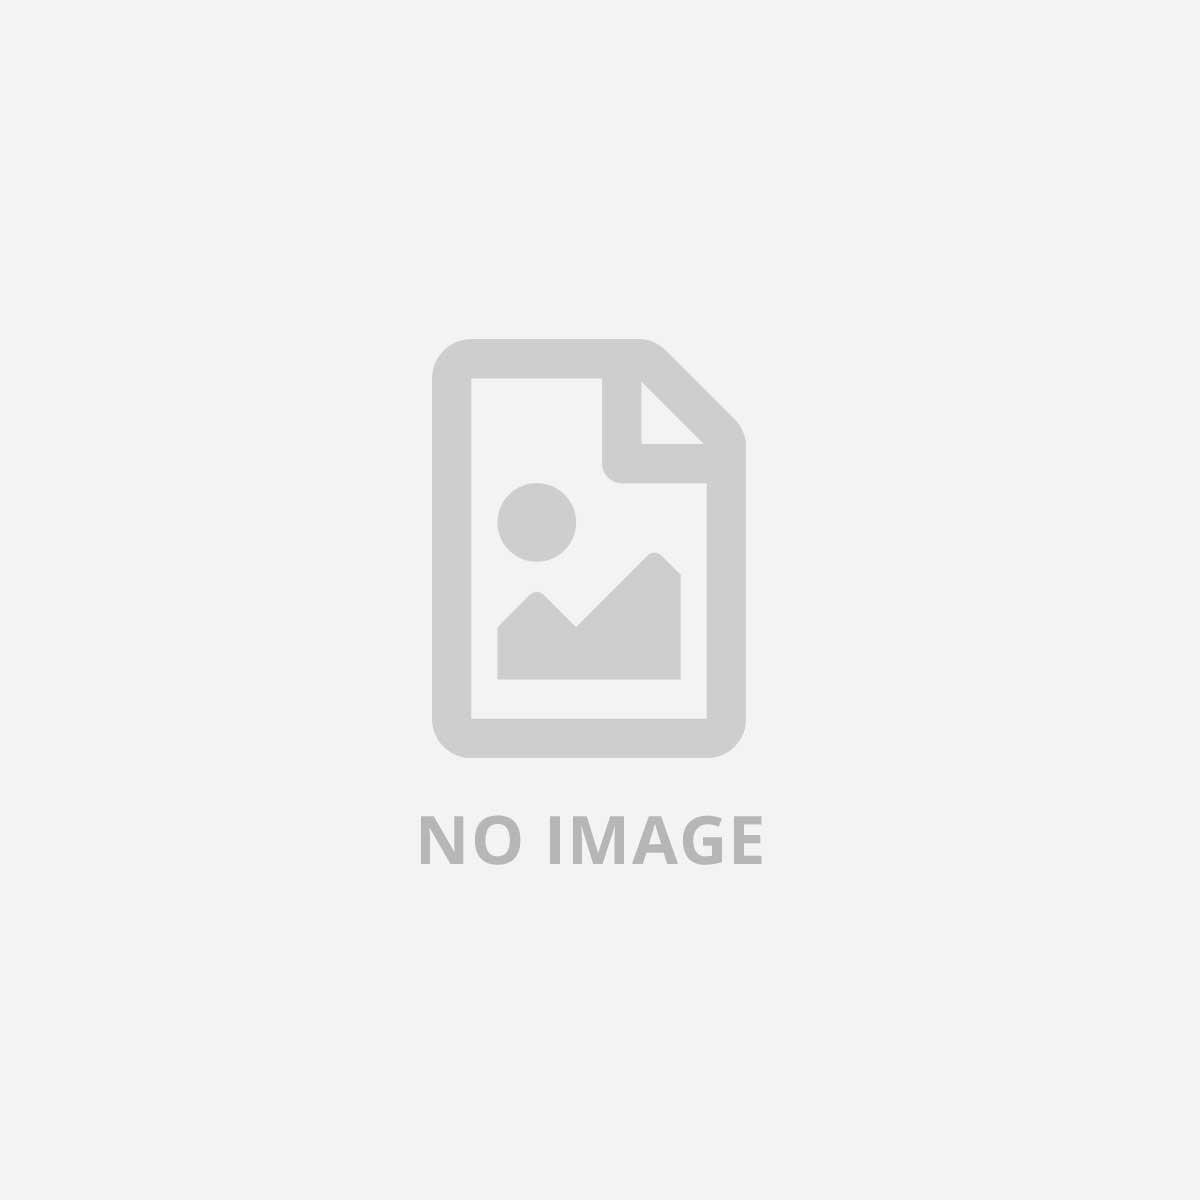 CONCEPTRONIC PCI EXPRESS CARD 2-PORT USB 3.0